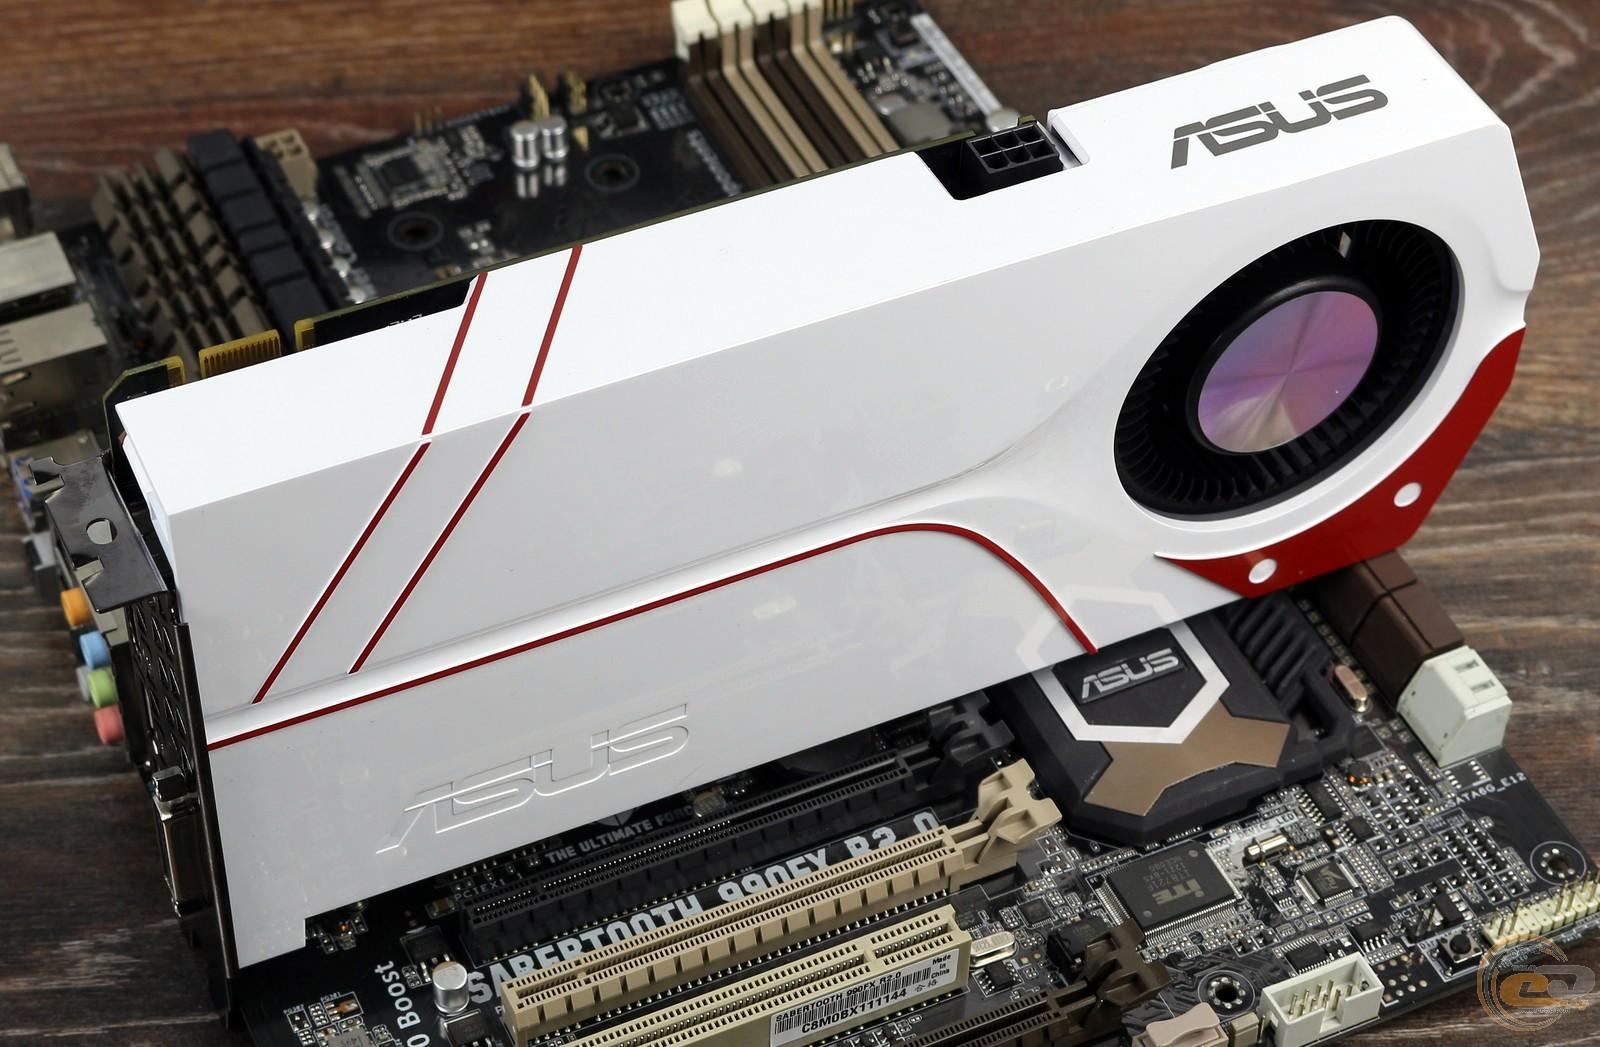 Asus Asus Geforce Gtx 960 Turbo Gtx960 Oc 4gd5 4gb 128 Bit Gddr5 Pci - Asus turbo geforce gtx 960 turbo gtx960 oc 2gd5